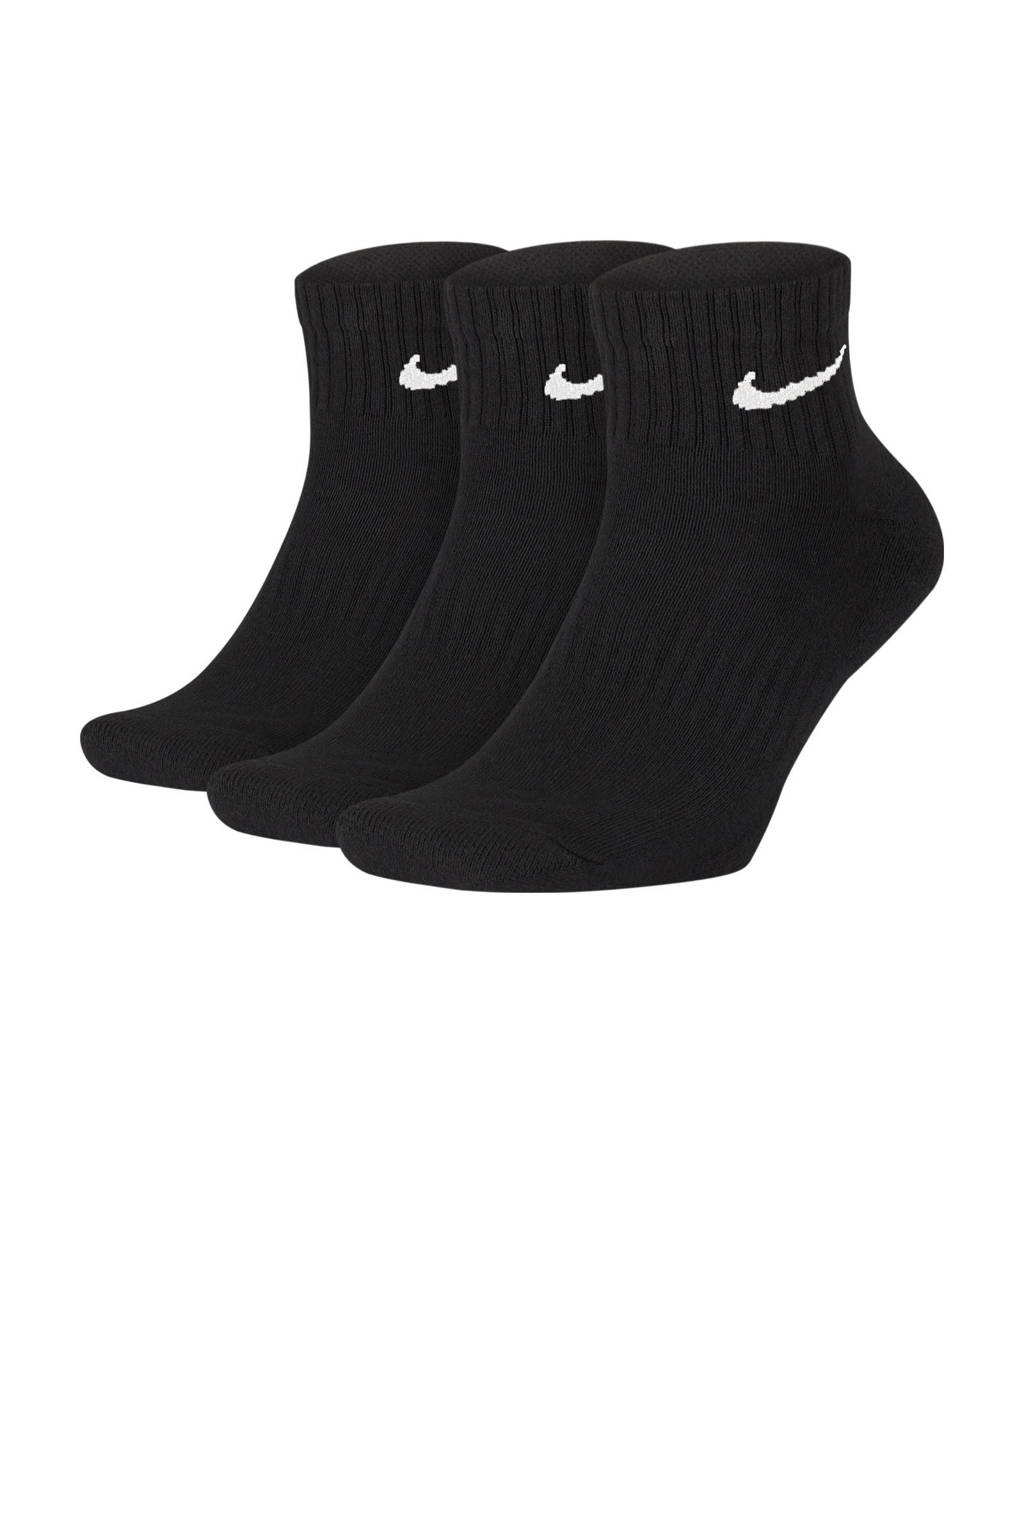 Nike   sportsokken - set van 3 zwart, Zwart/wit